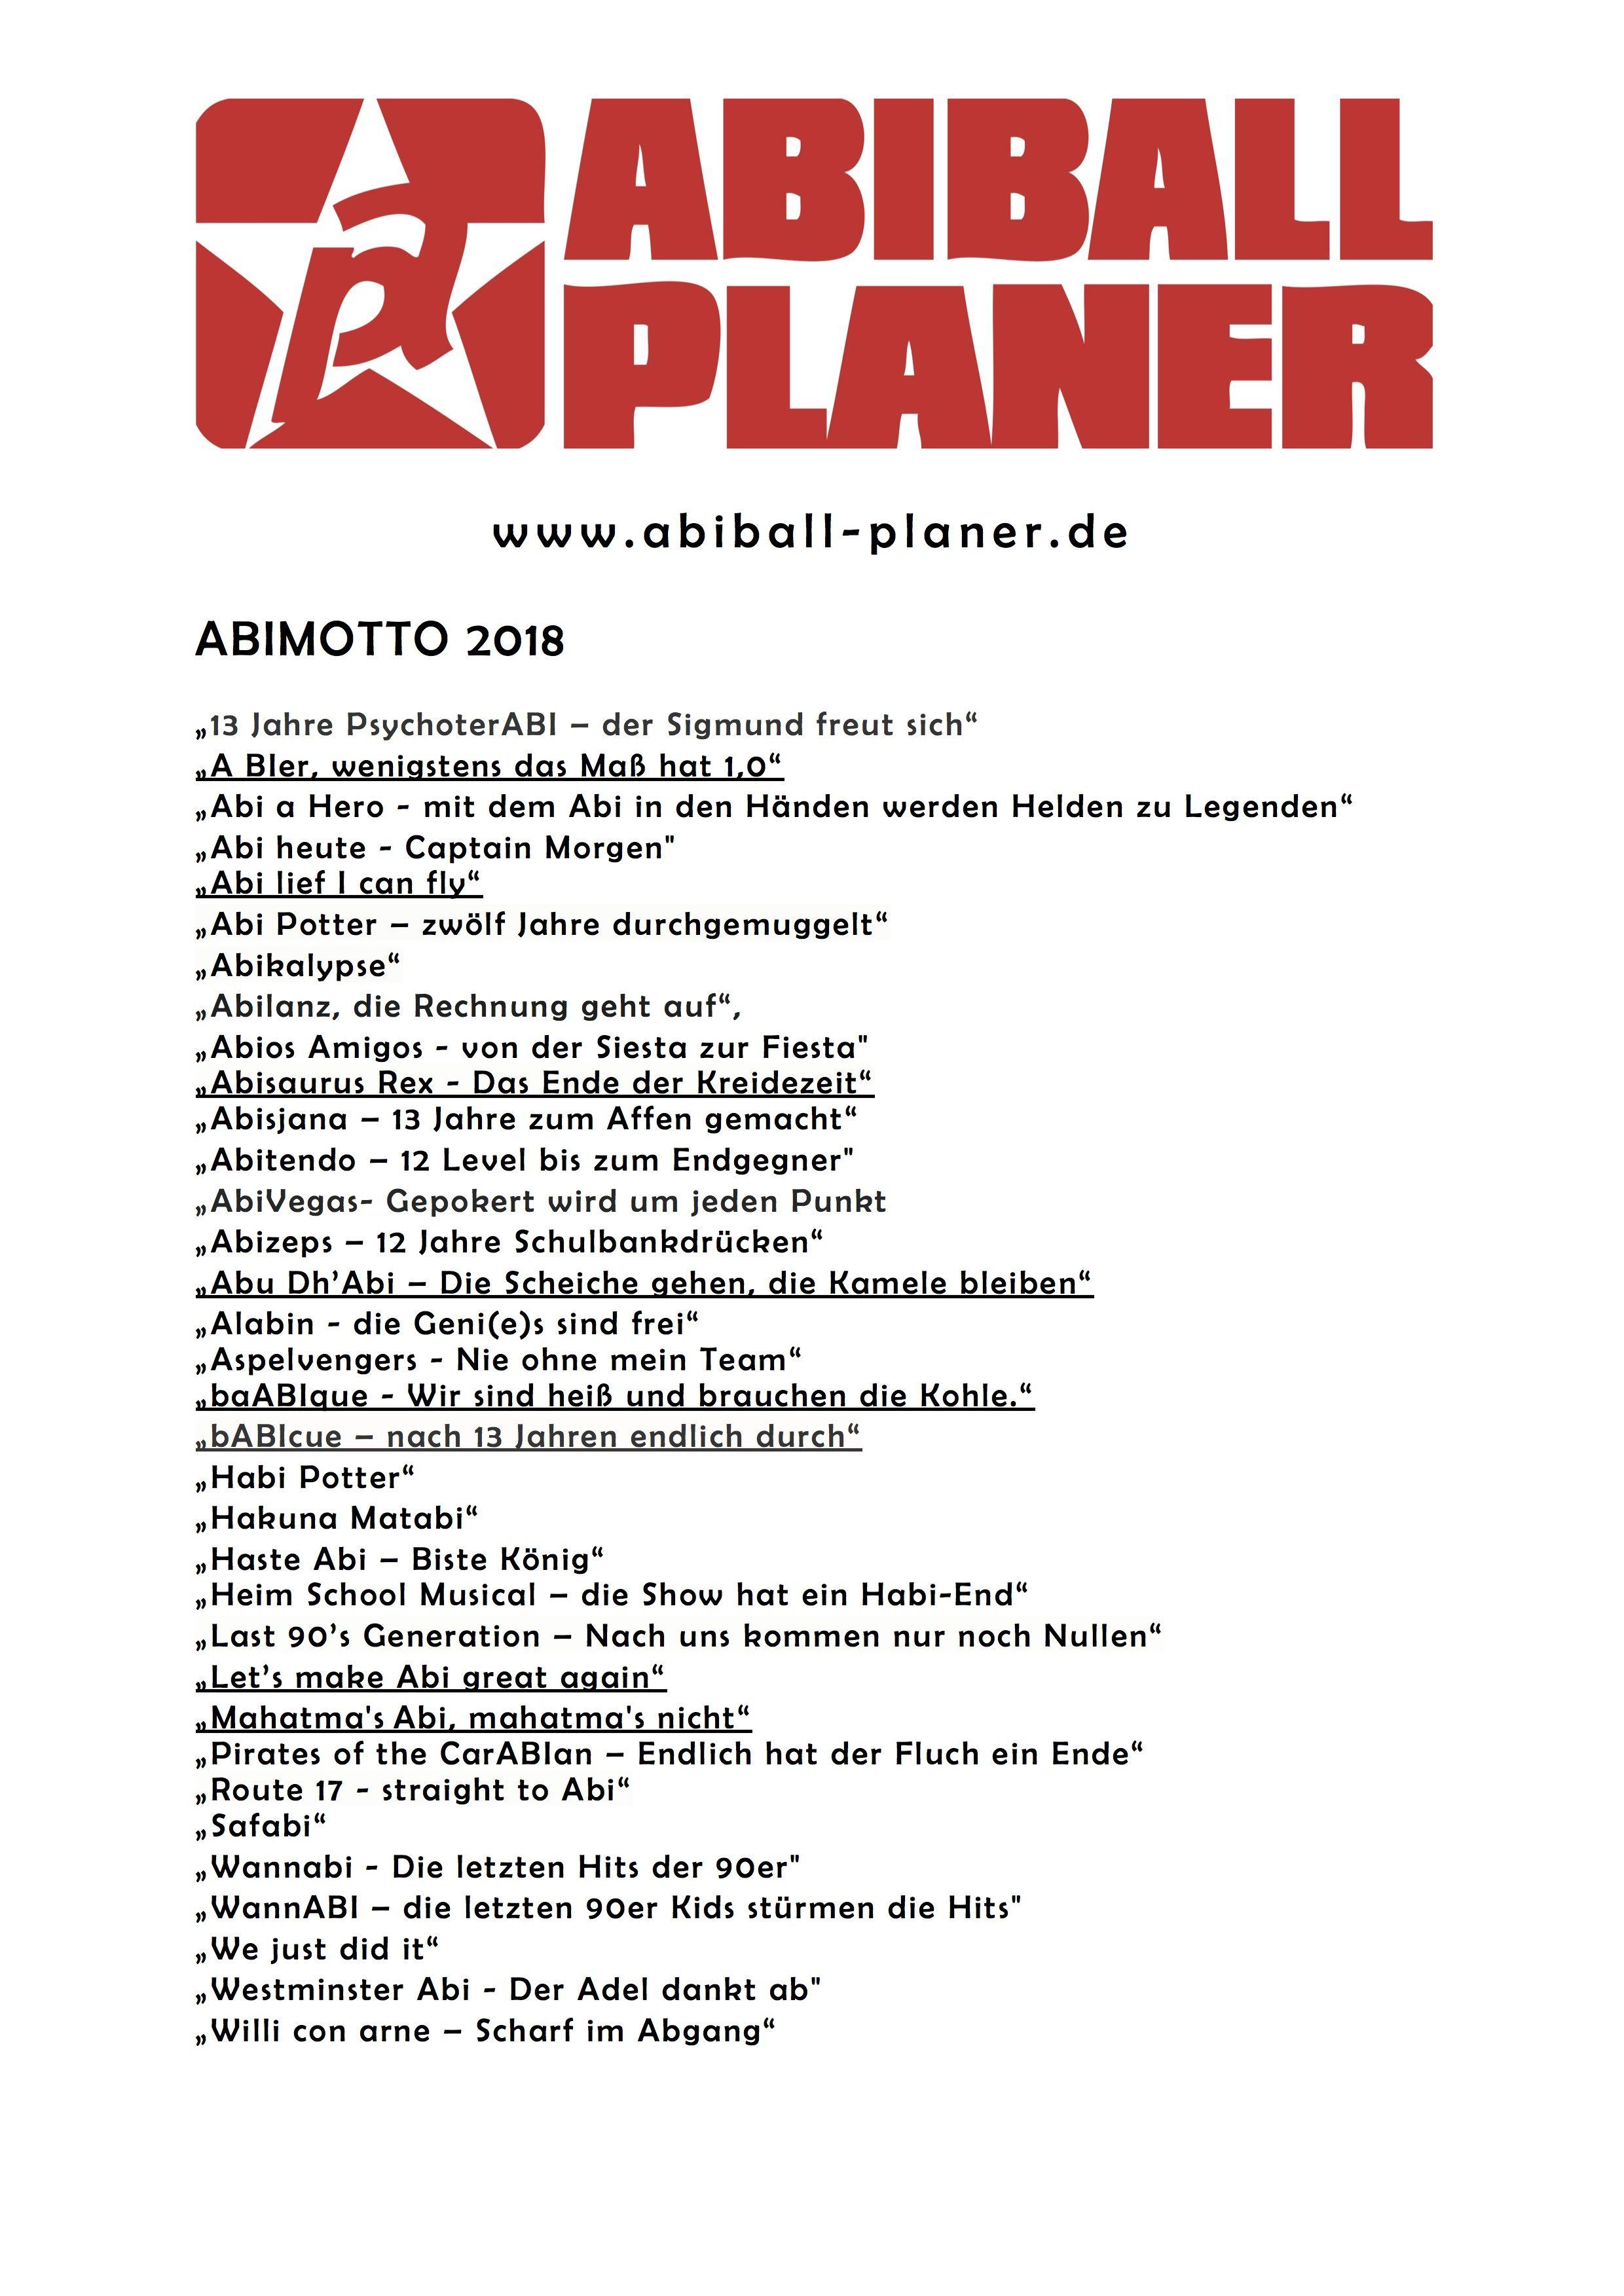 Abiball Planer Abimotto 2018 Abiball Agentur Berlin 2017